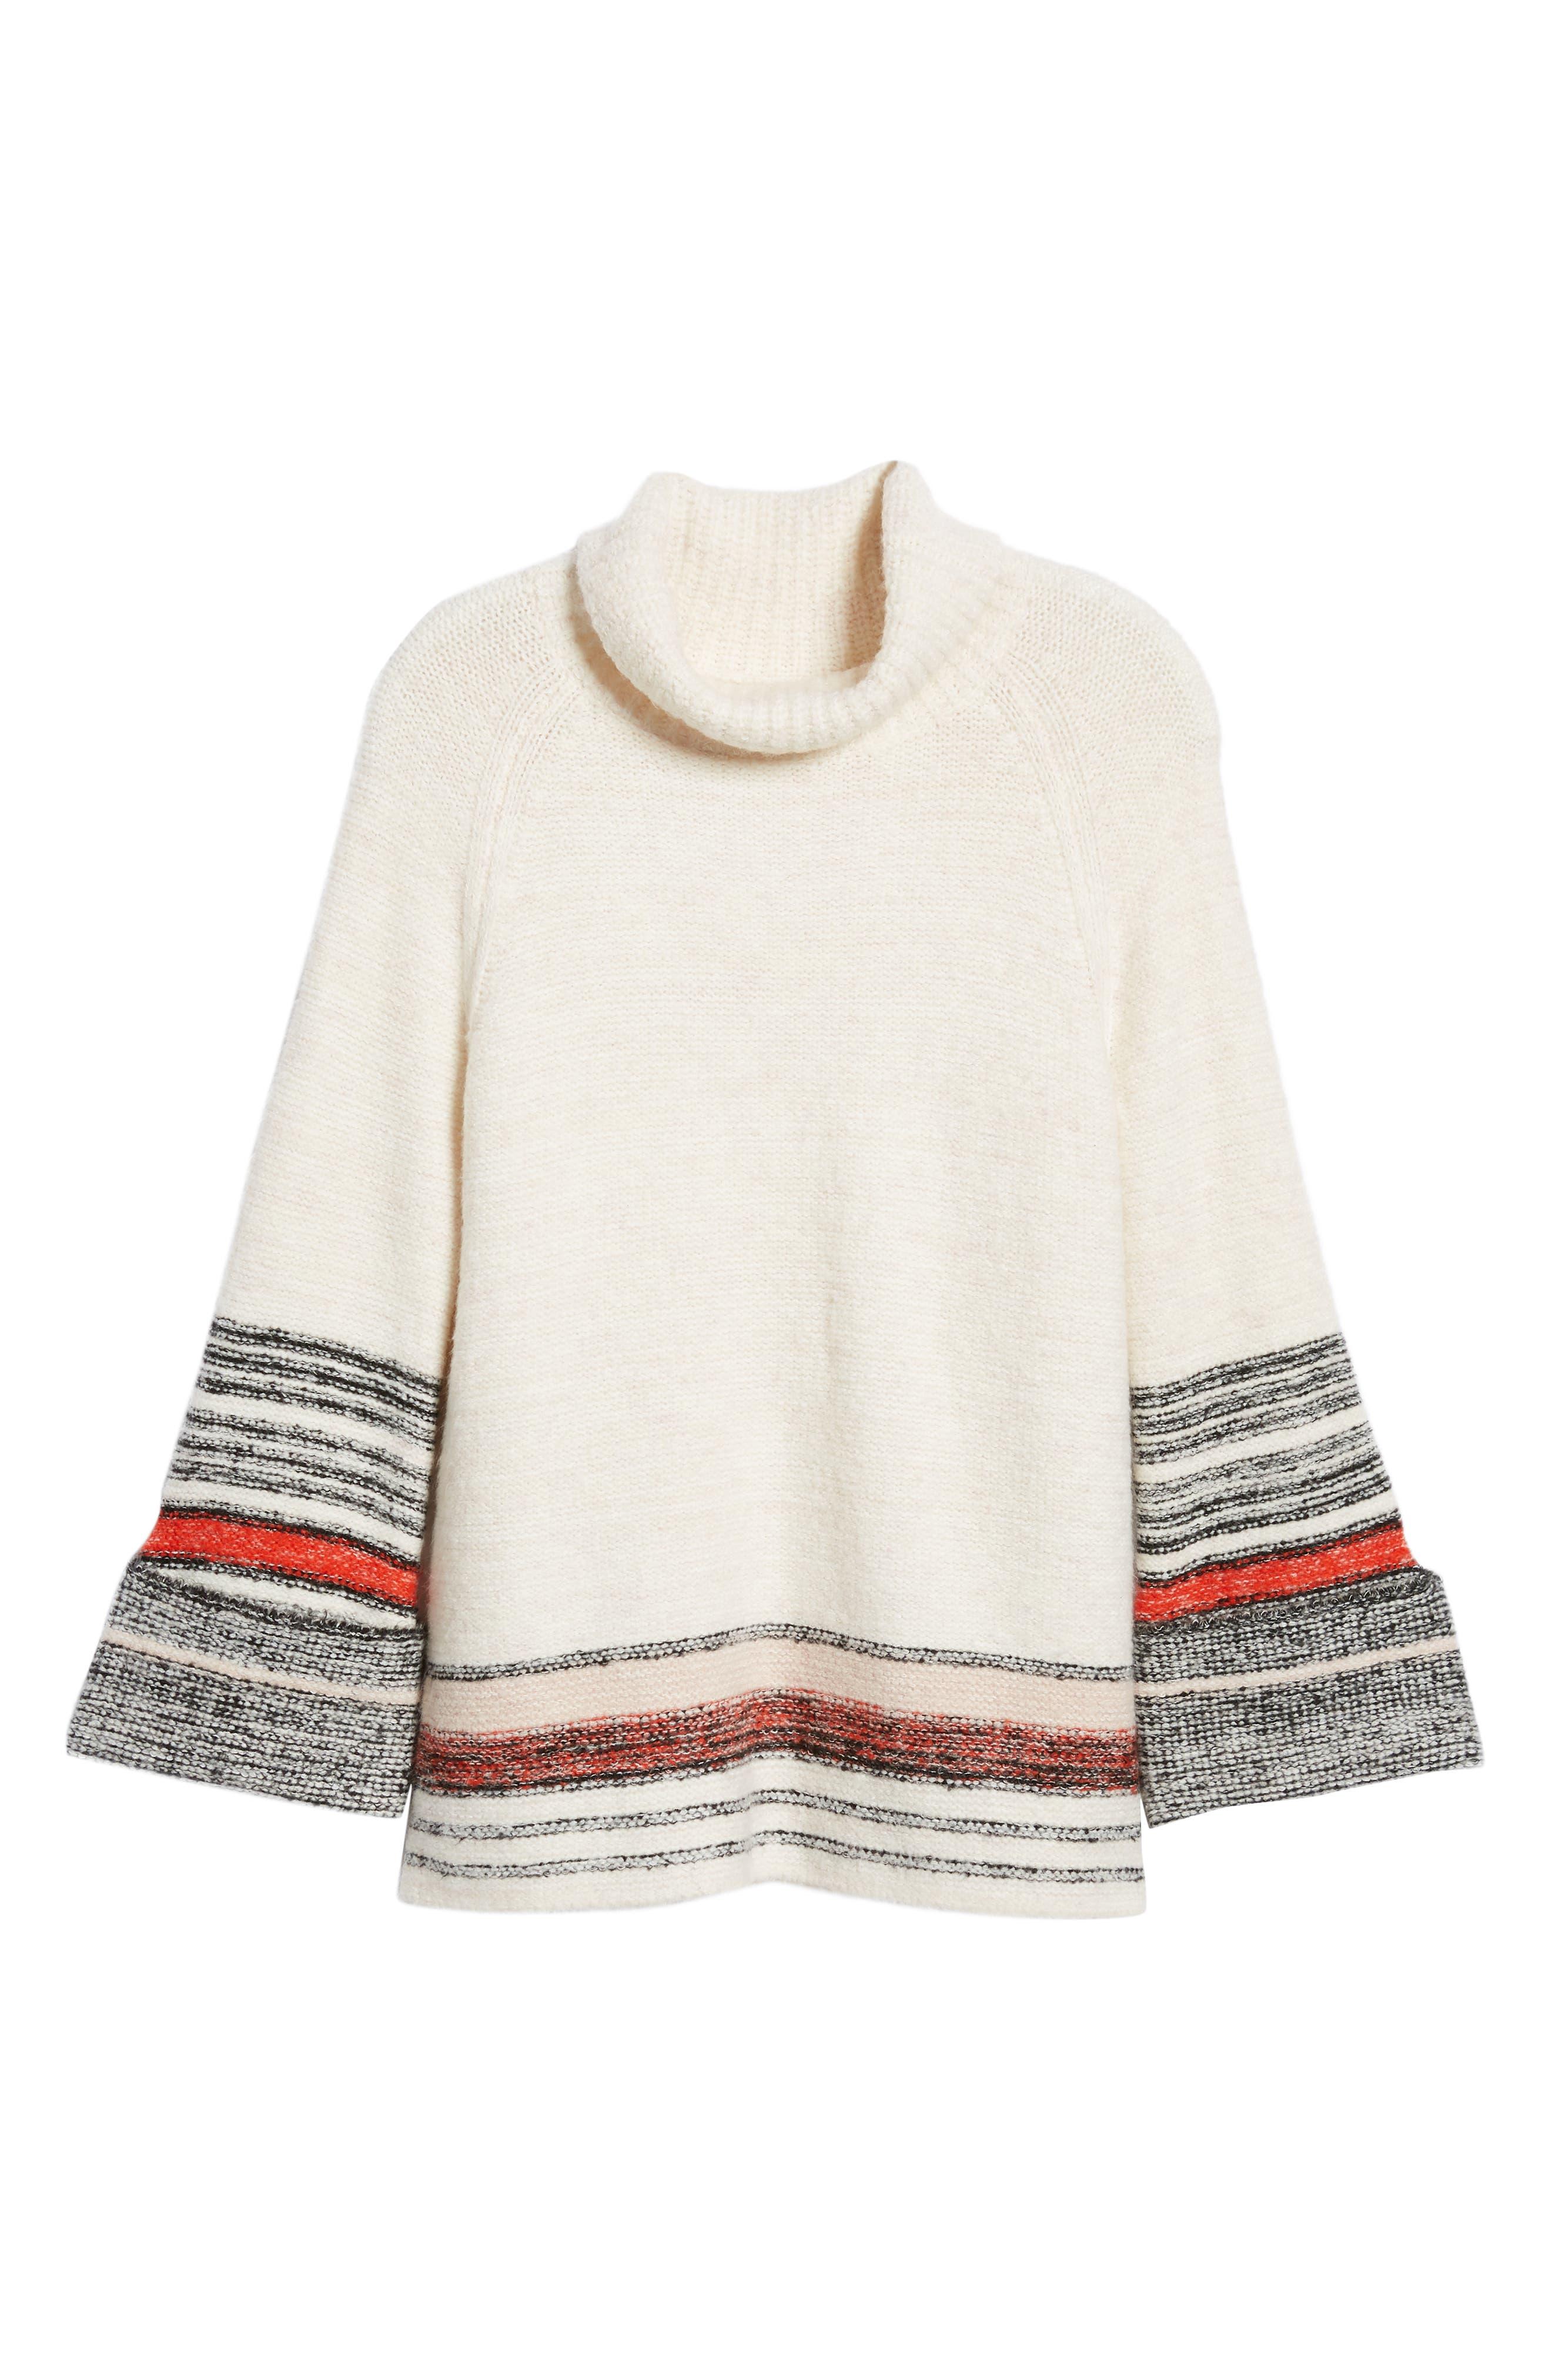 Border Stripe Sweater,                             Alternate thumbnail 6, color,                             IVORY COMBO